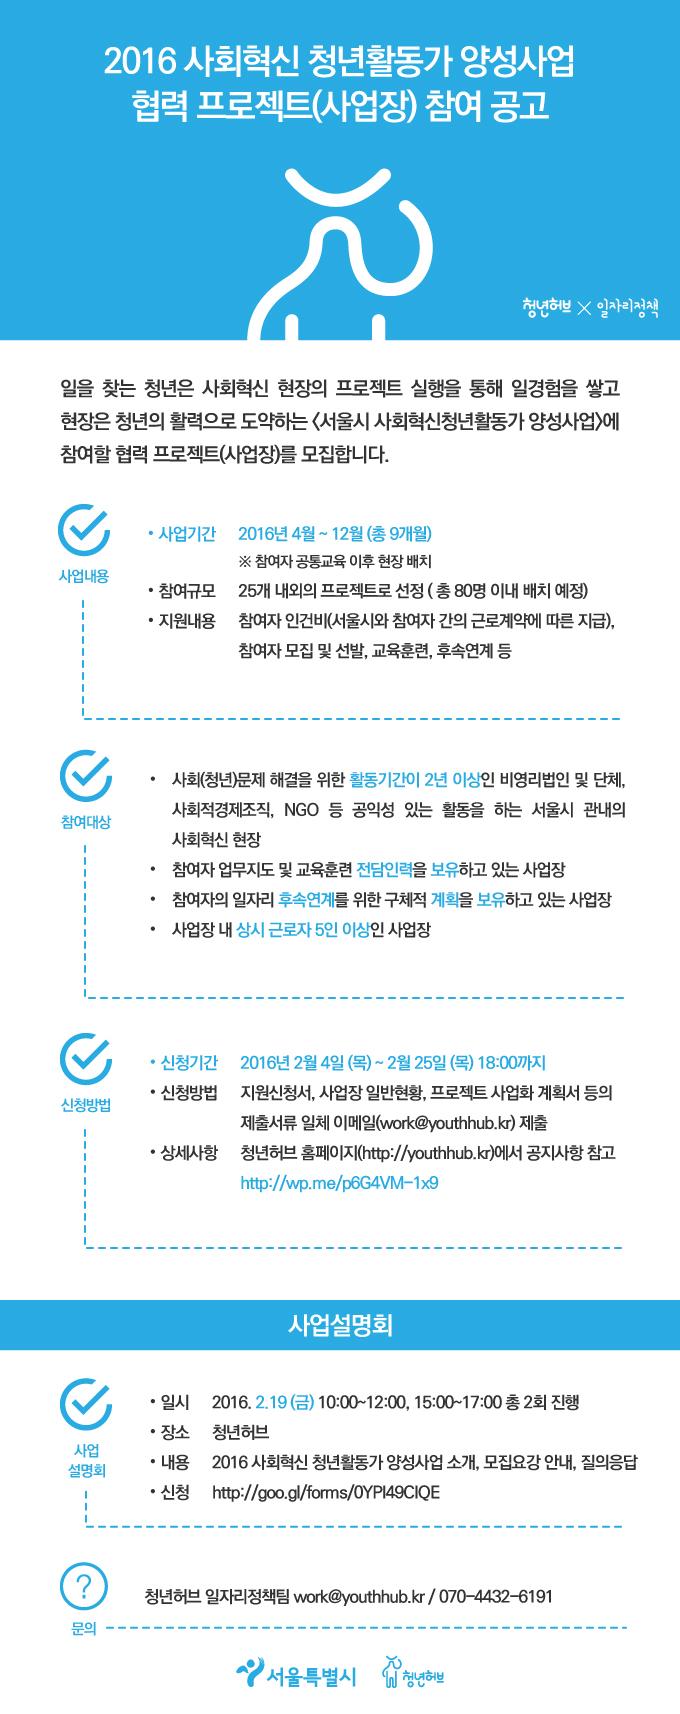 3. 0204_hub_사회혁신청년활동가사업_웹홍보물.jpg